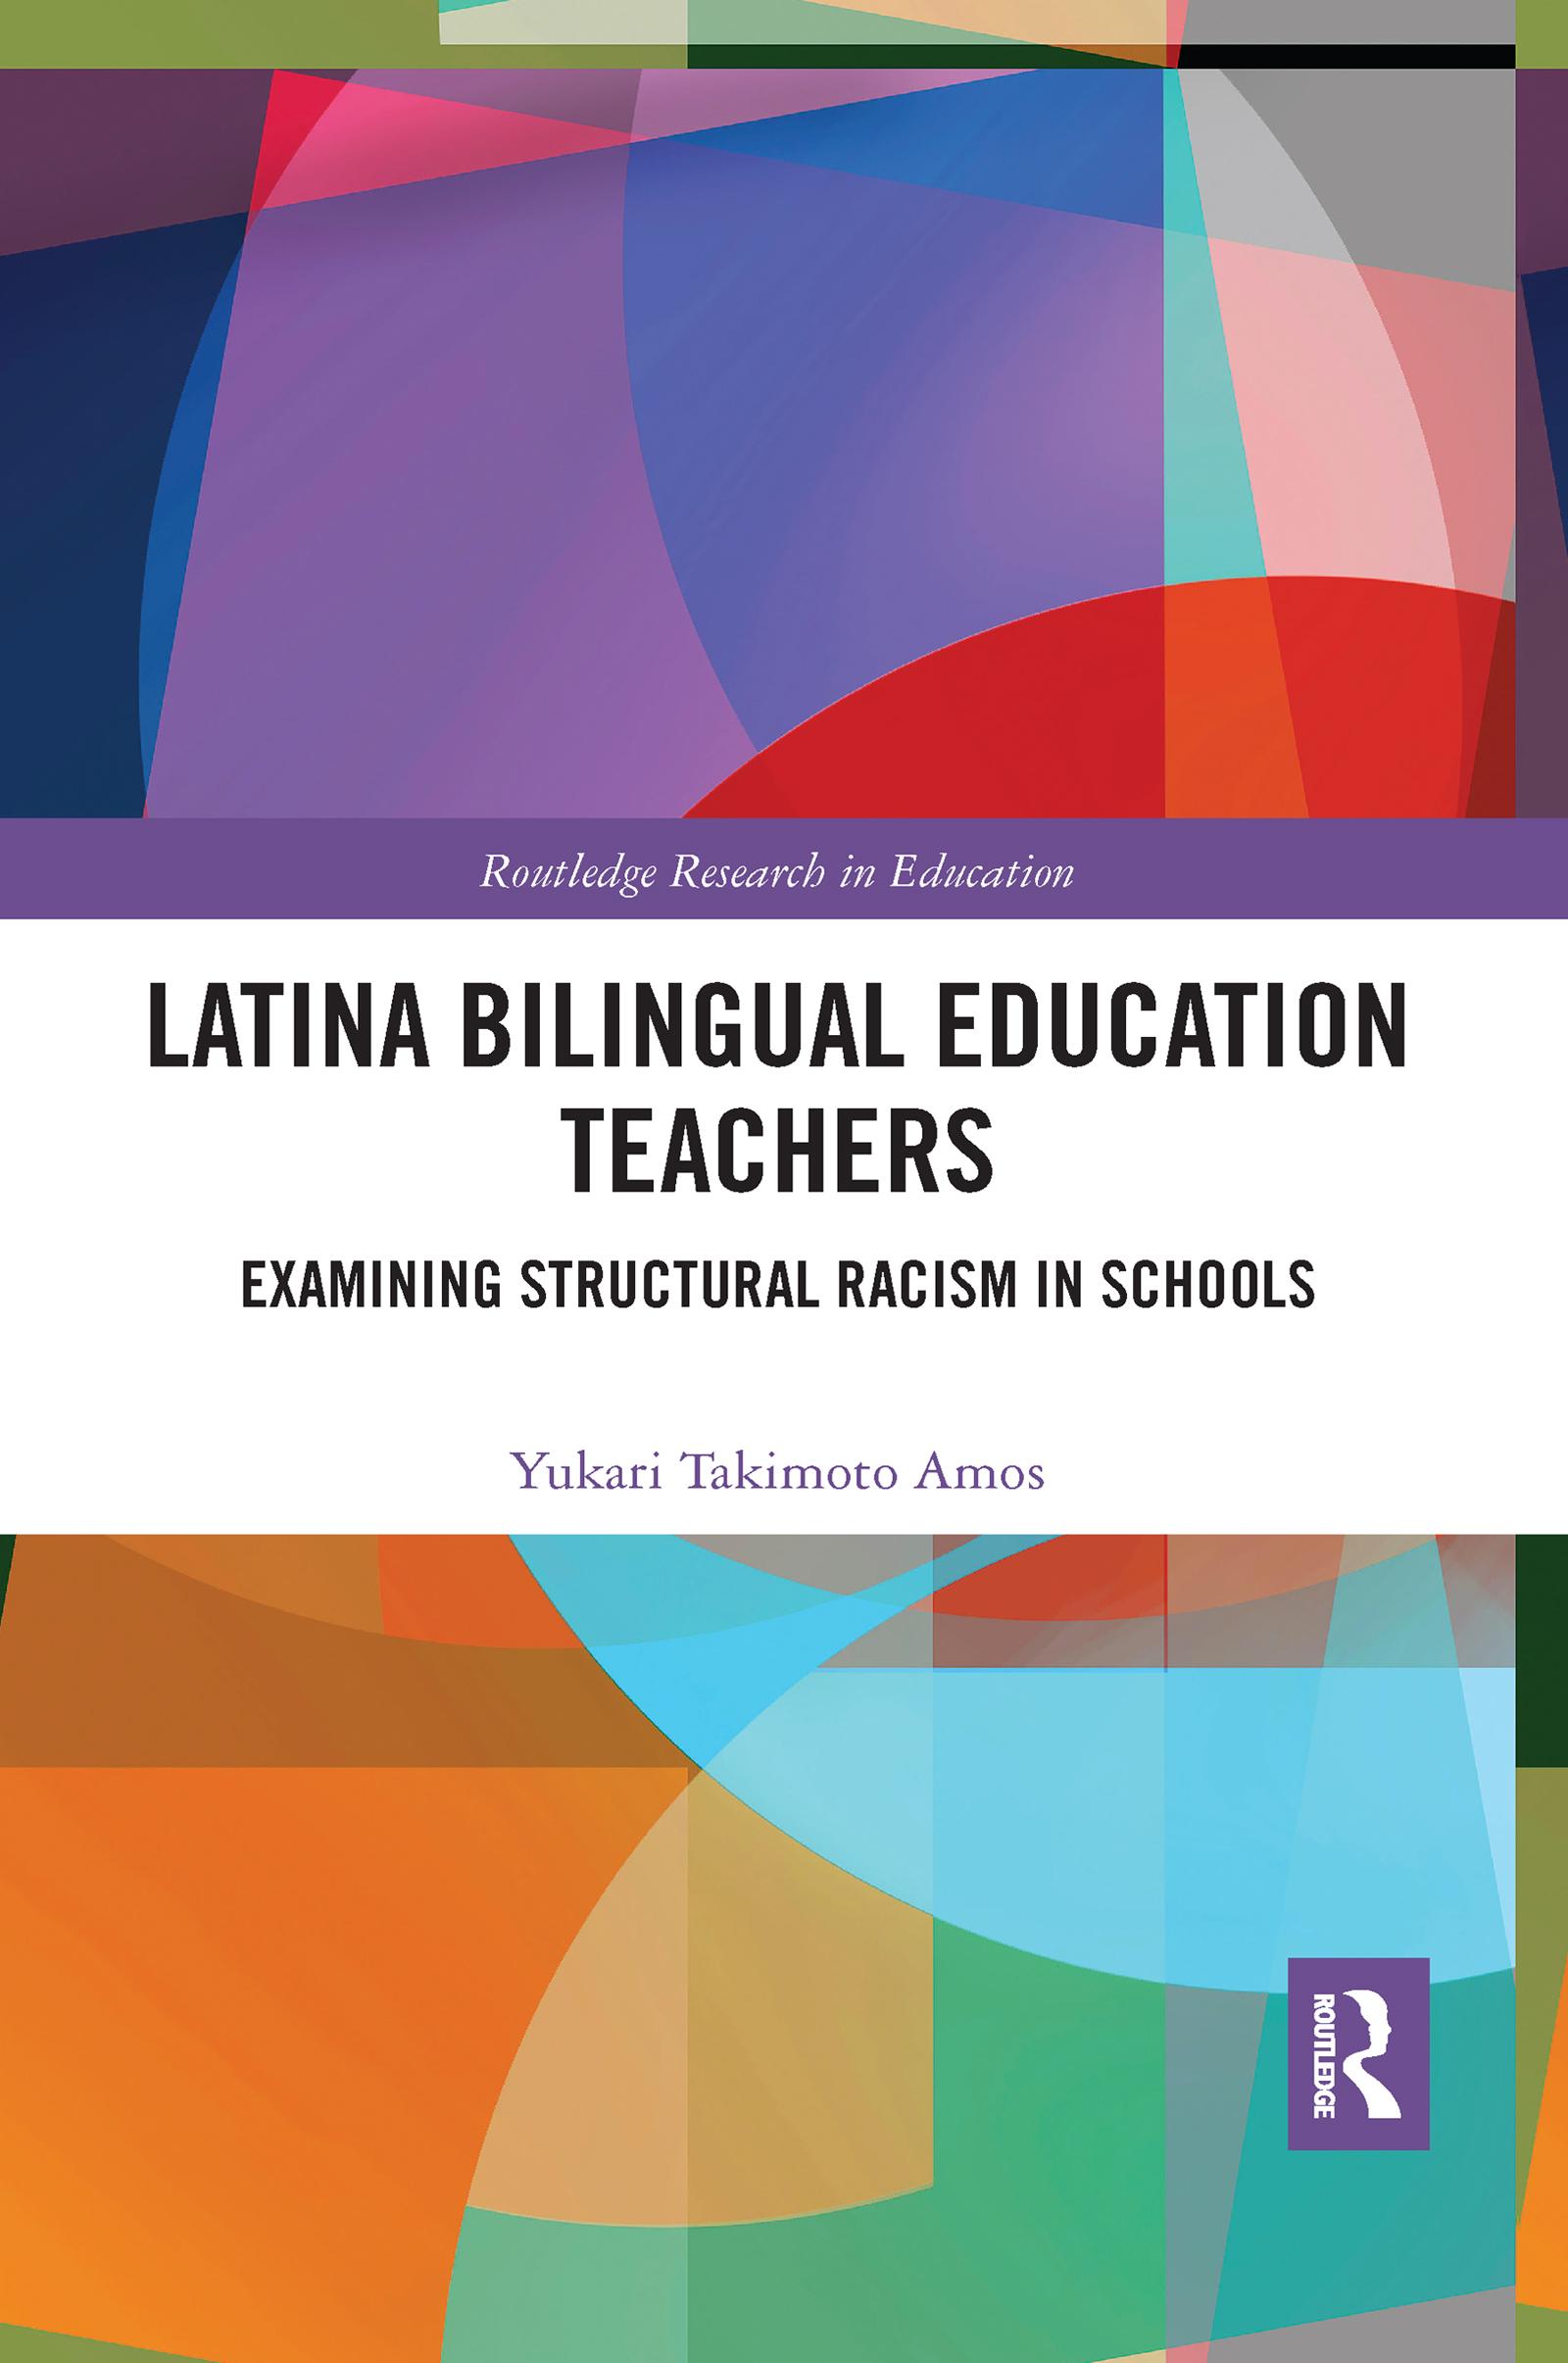 Latina Bilingual Education Teachers